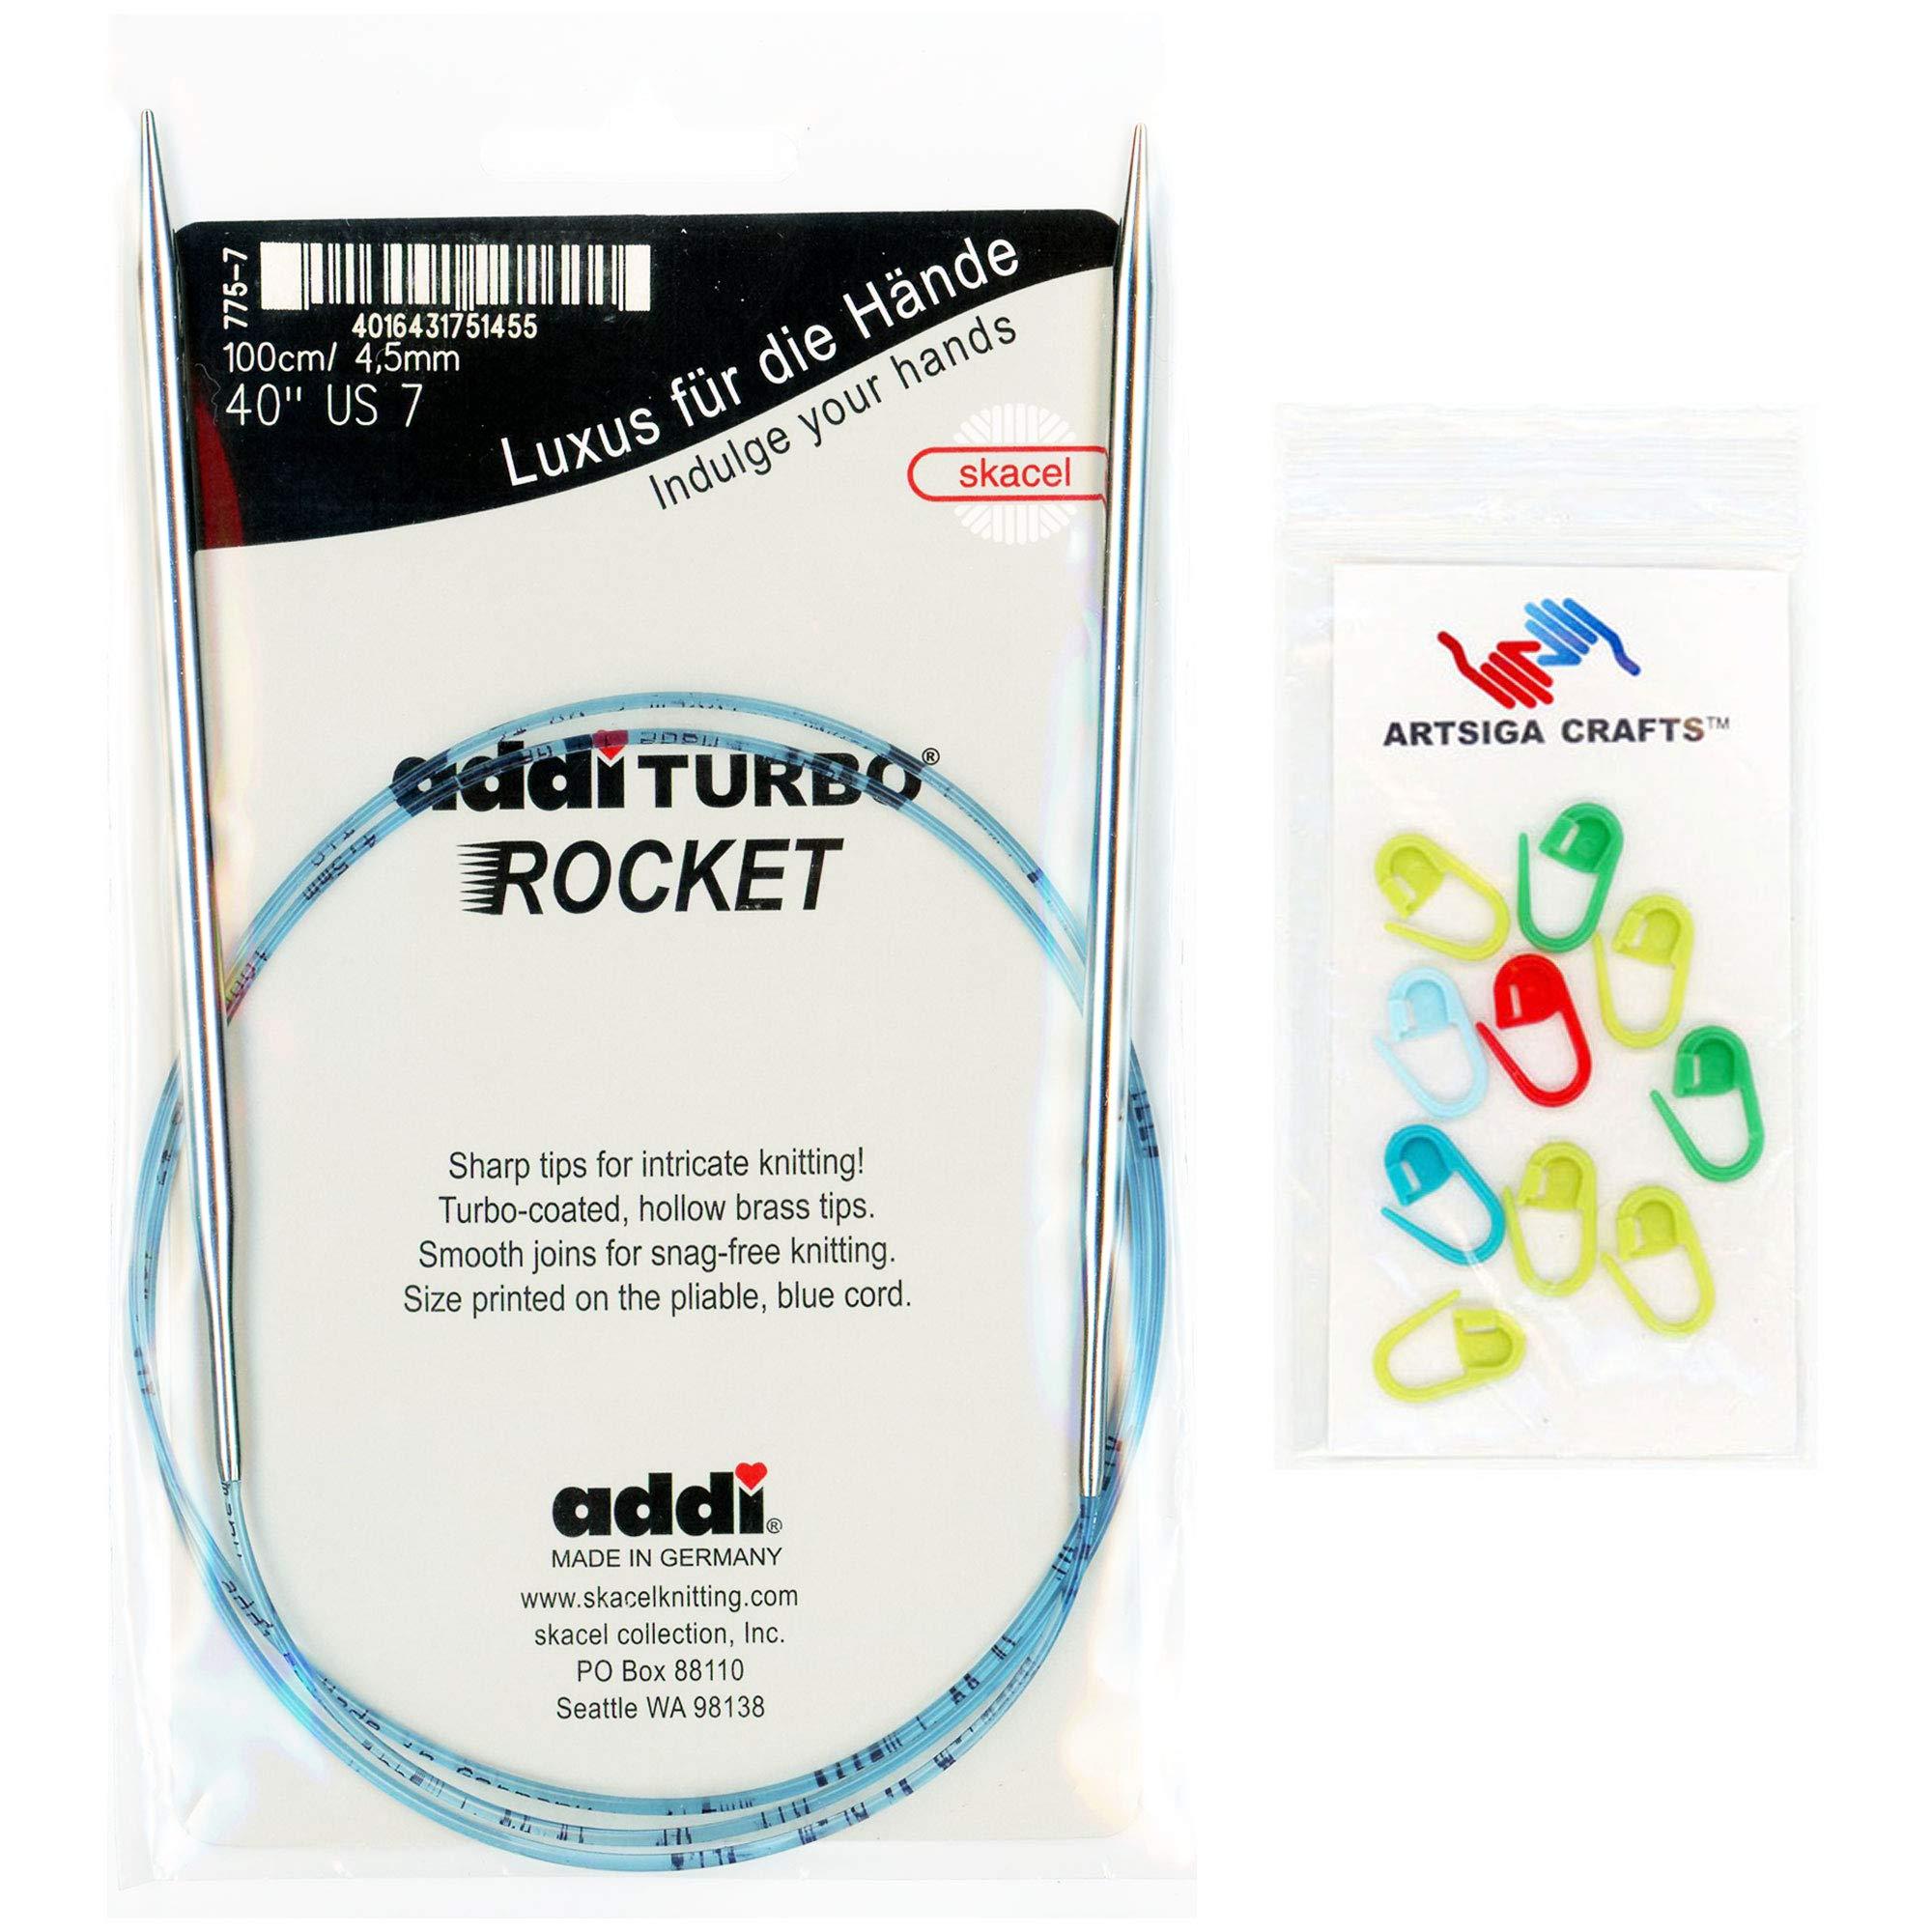 addi Knitting Needle Circular Turbo Rocket Lace White-Bronze Skacel Exclusive Blue Cord 60 inch (150cm) Size US 13 (9.0mm) Bundle with 10 Artsiga Crafts Stitch Markers